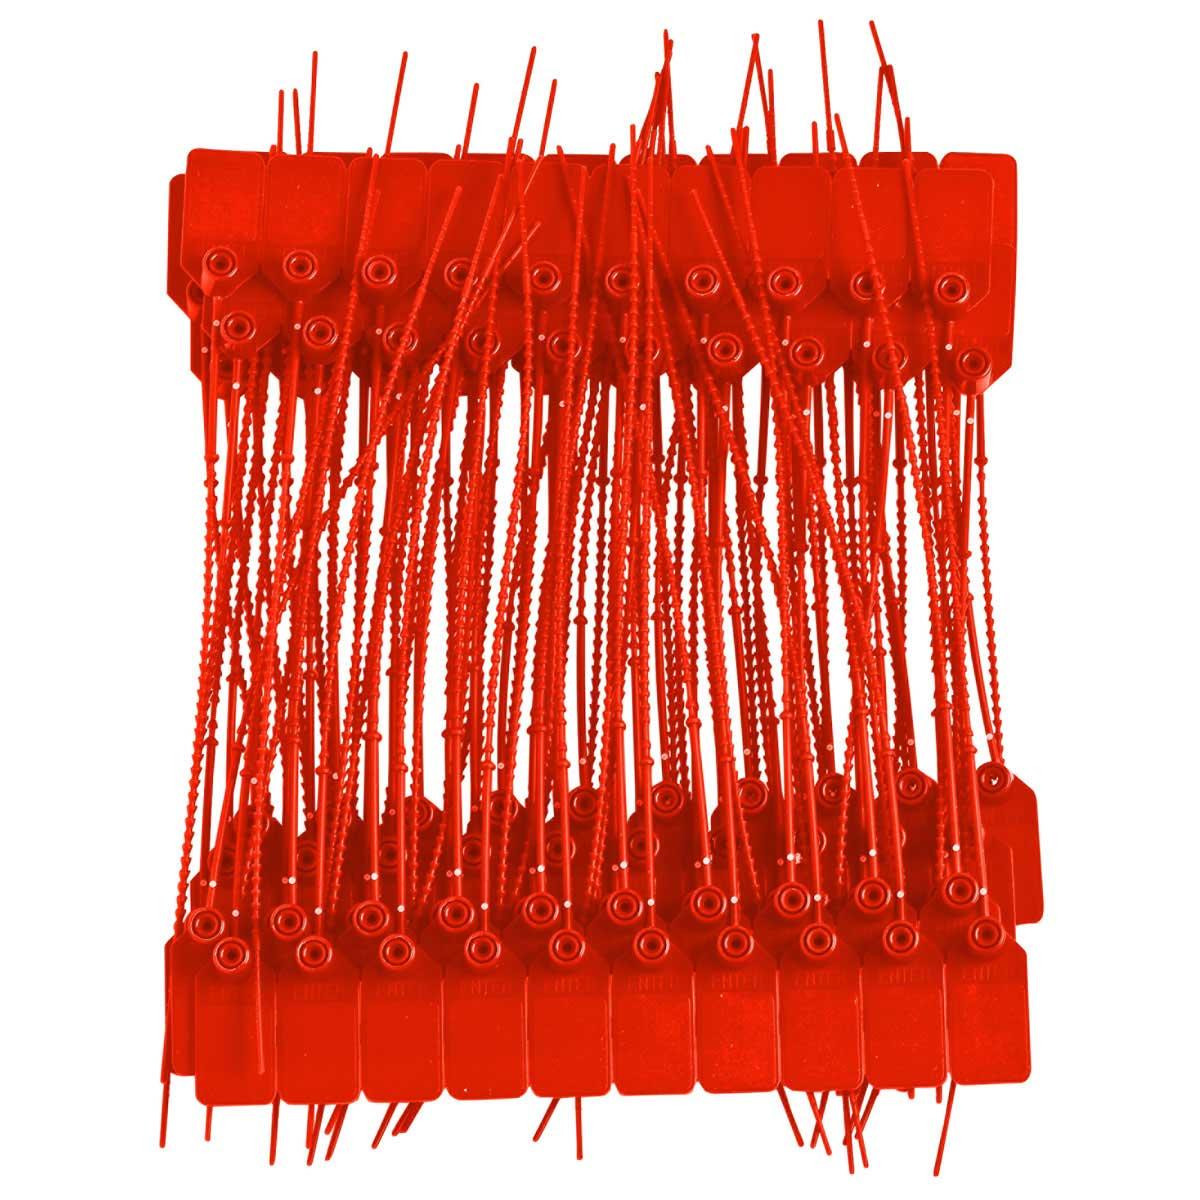 BRADY 95150 UL FIRE EXTINGUISHERSEALS RED